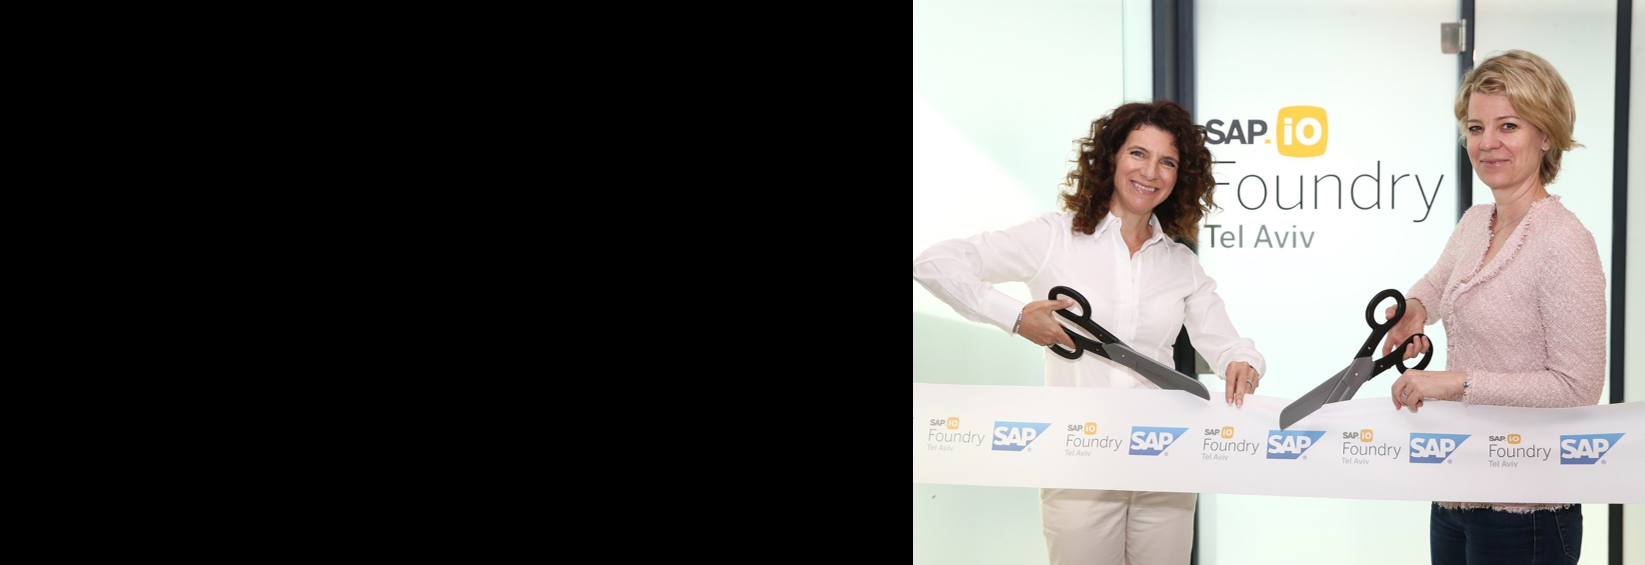 German Tech Giant SAP Launches Tel Aviv Start-up Accelerator